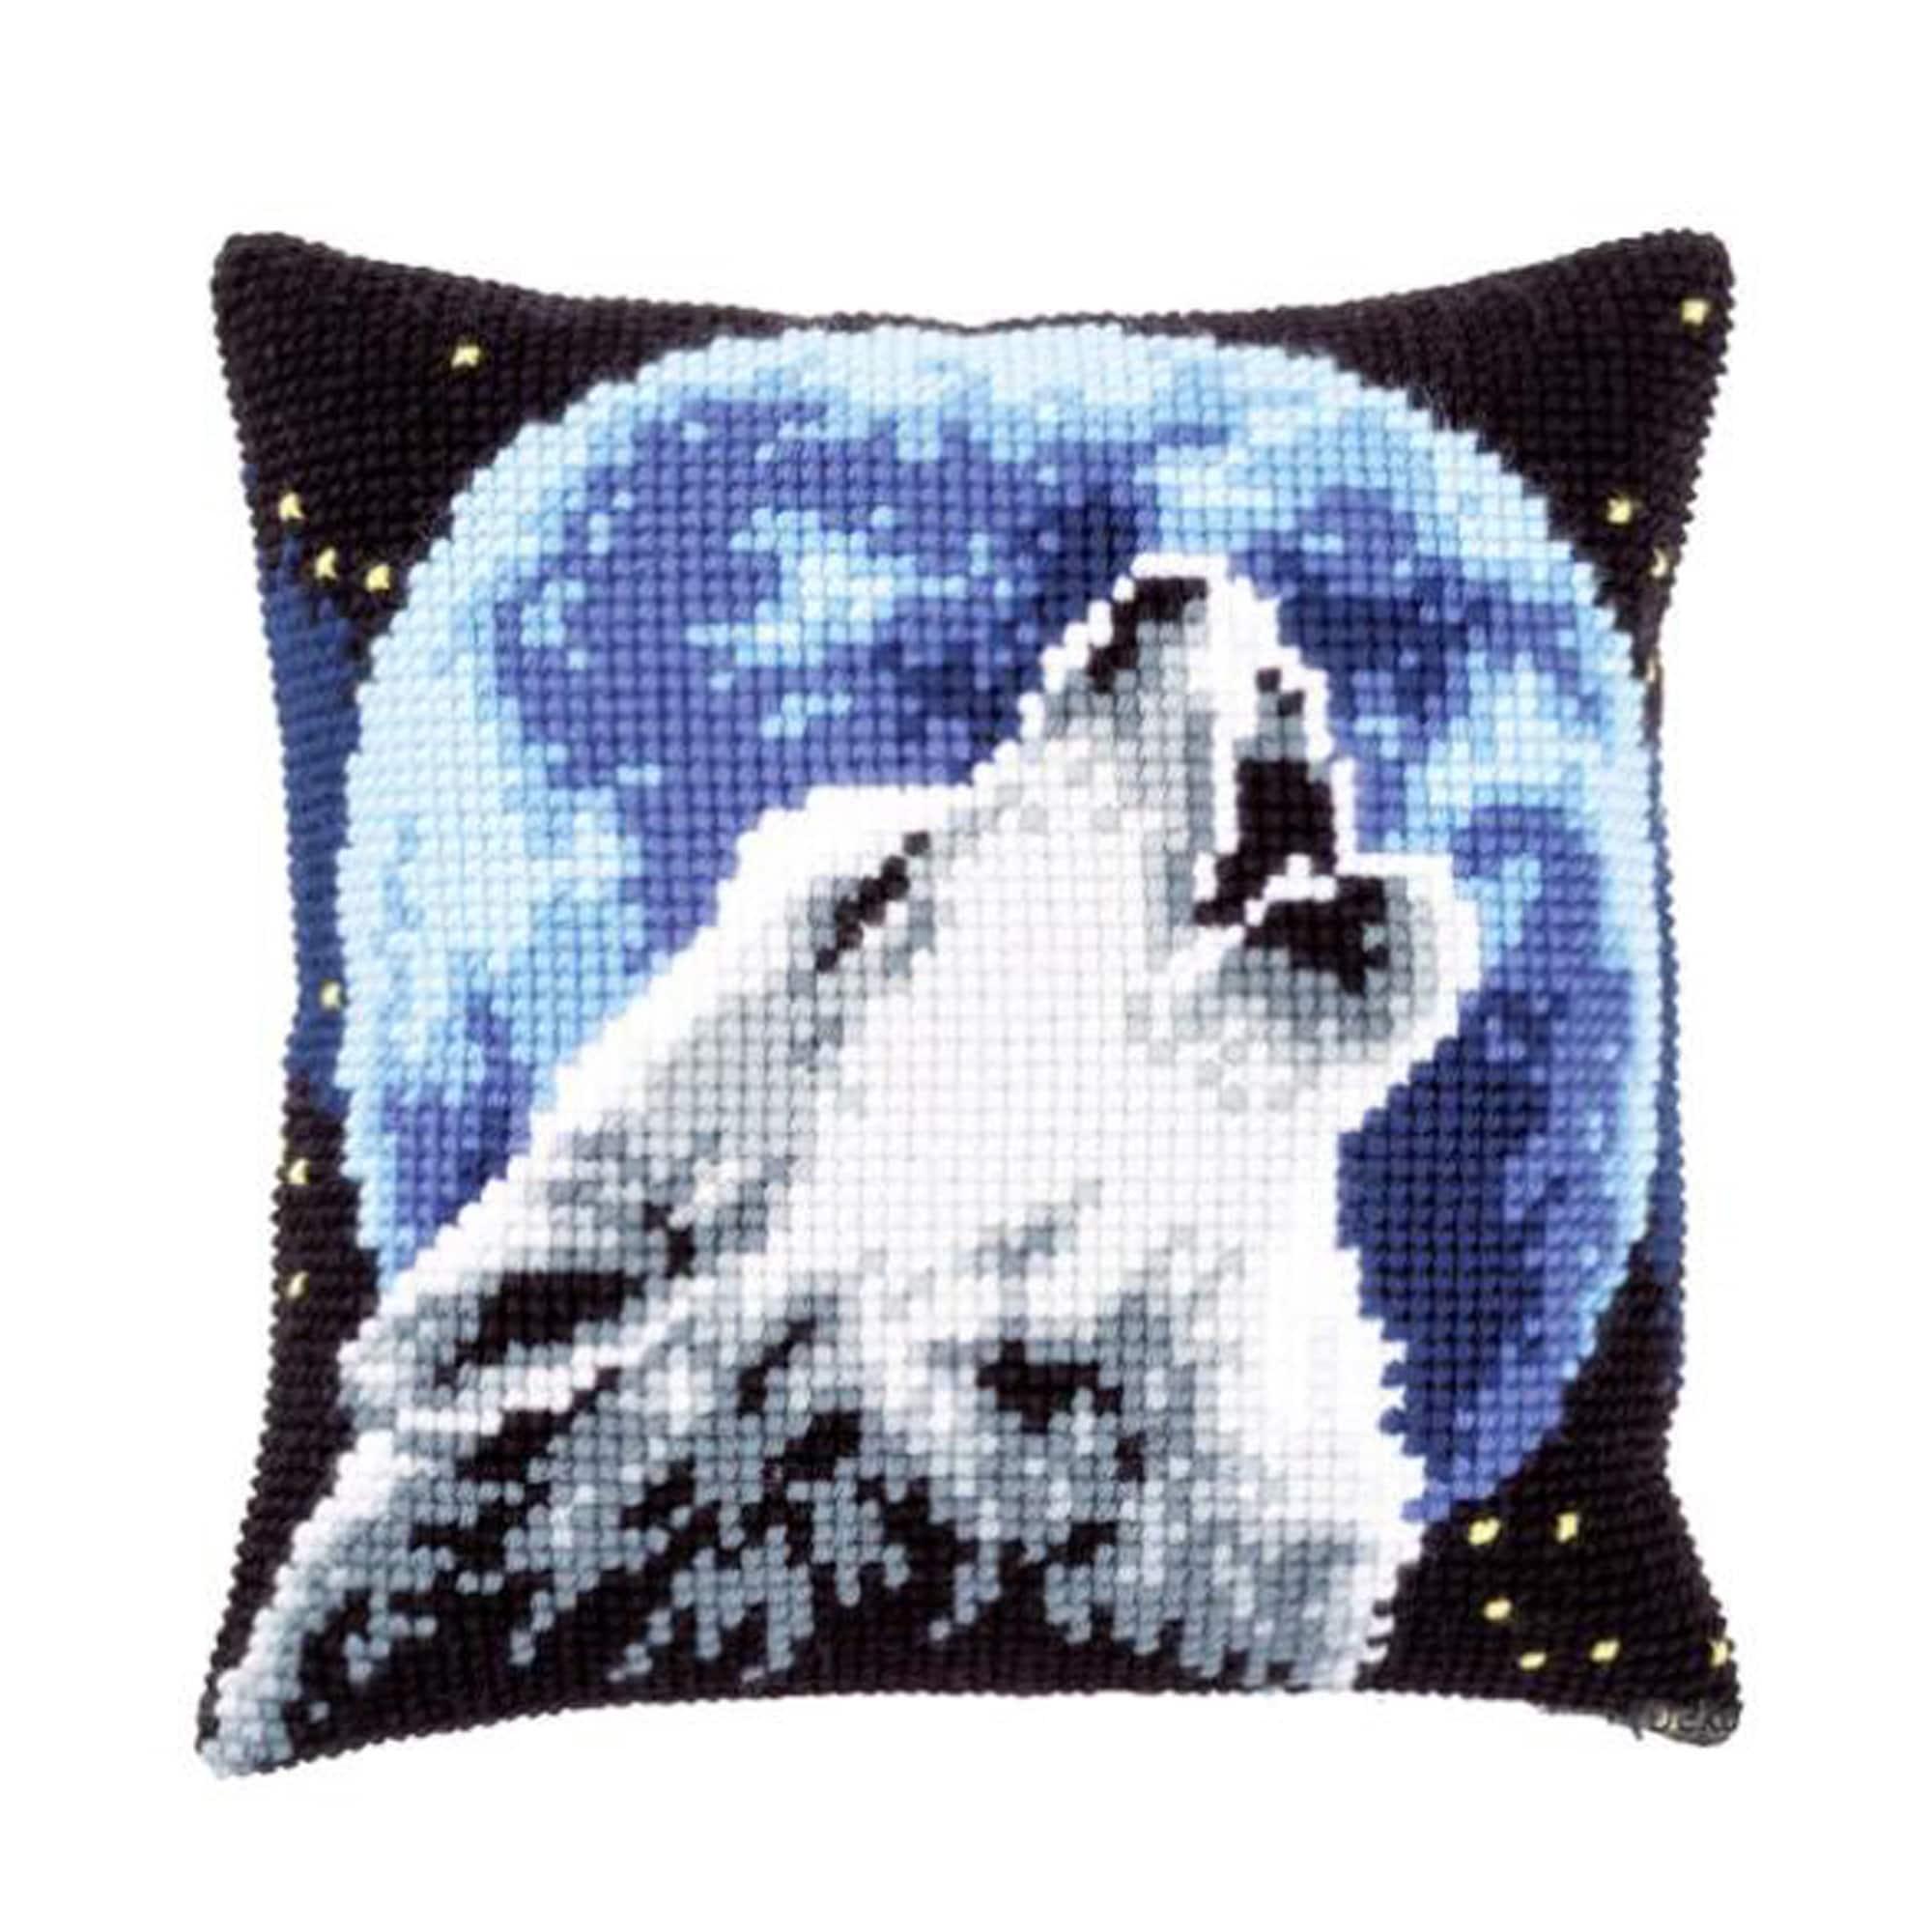 animal Latch hook pillow DIY cross stitch kit size 40cm*40cm 5D embroidery pattern woolen mesh Alpaca pillow